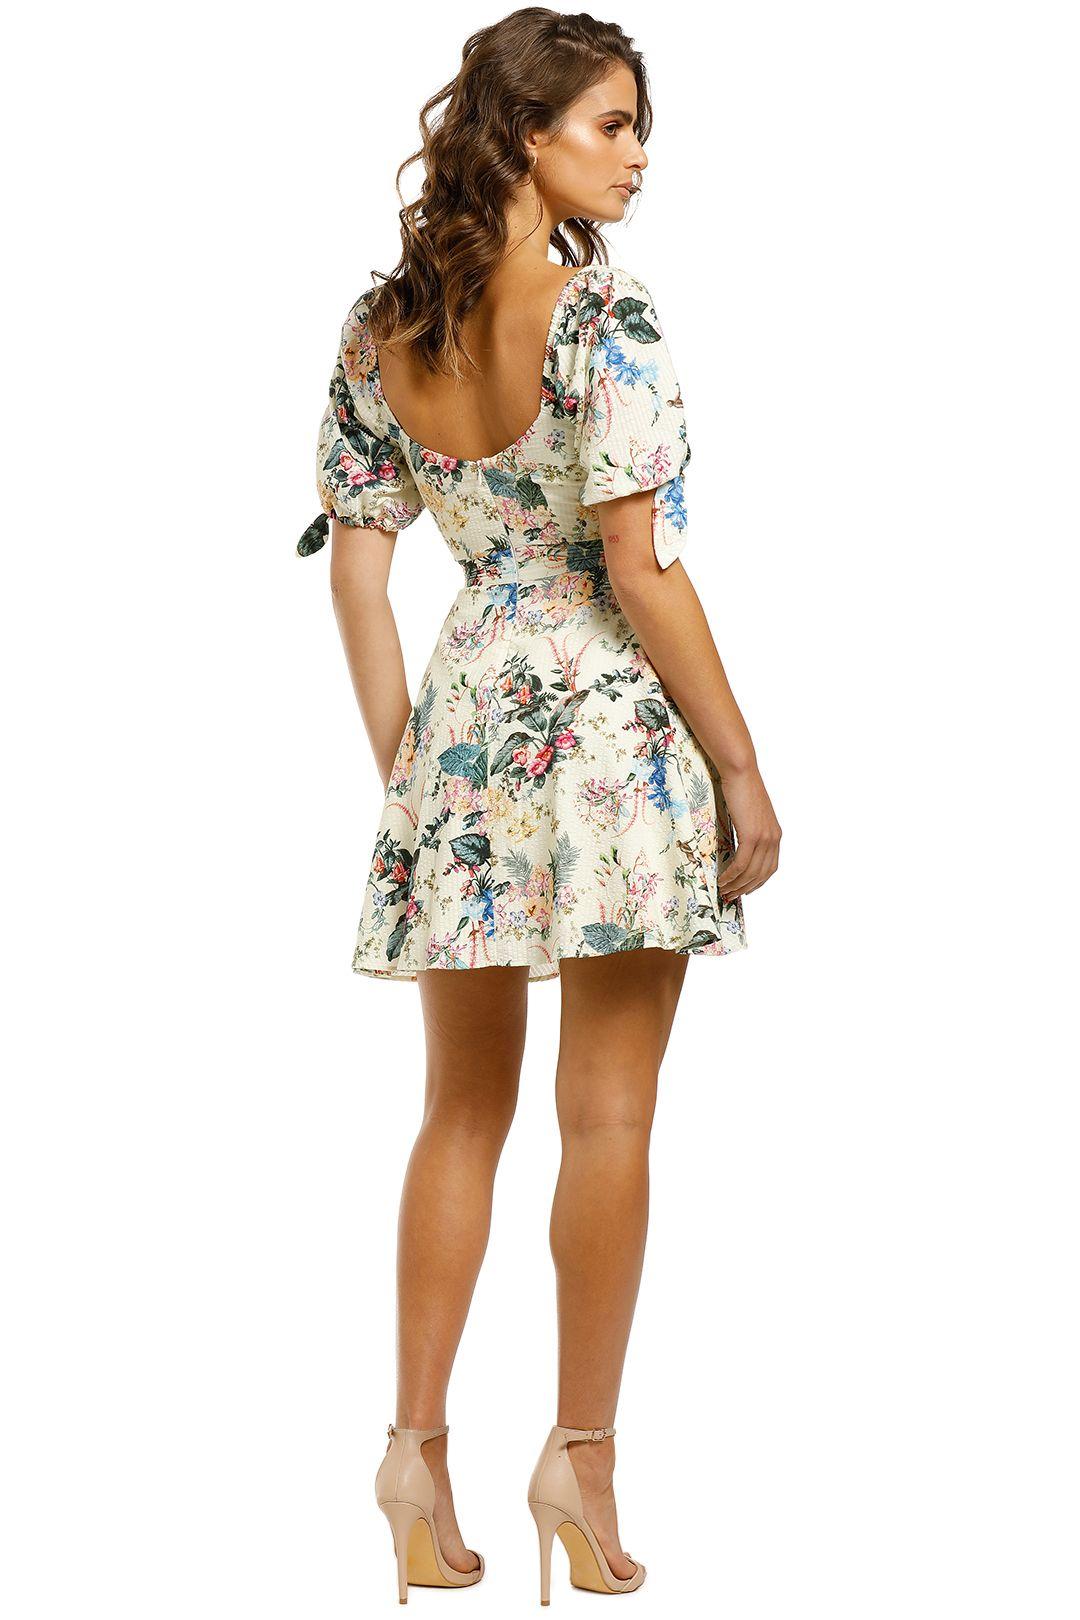 Tigerlily-Kalani-Short-Dress-Floral-Back